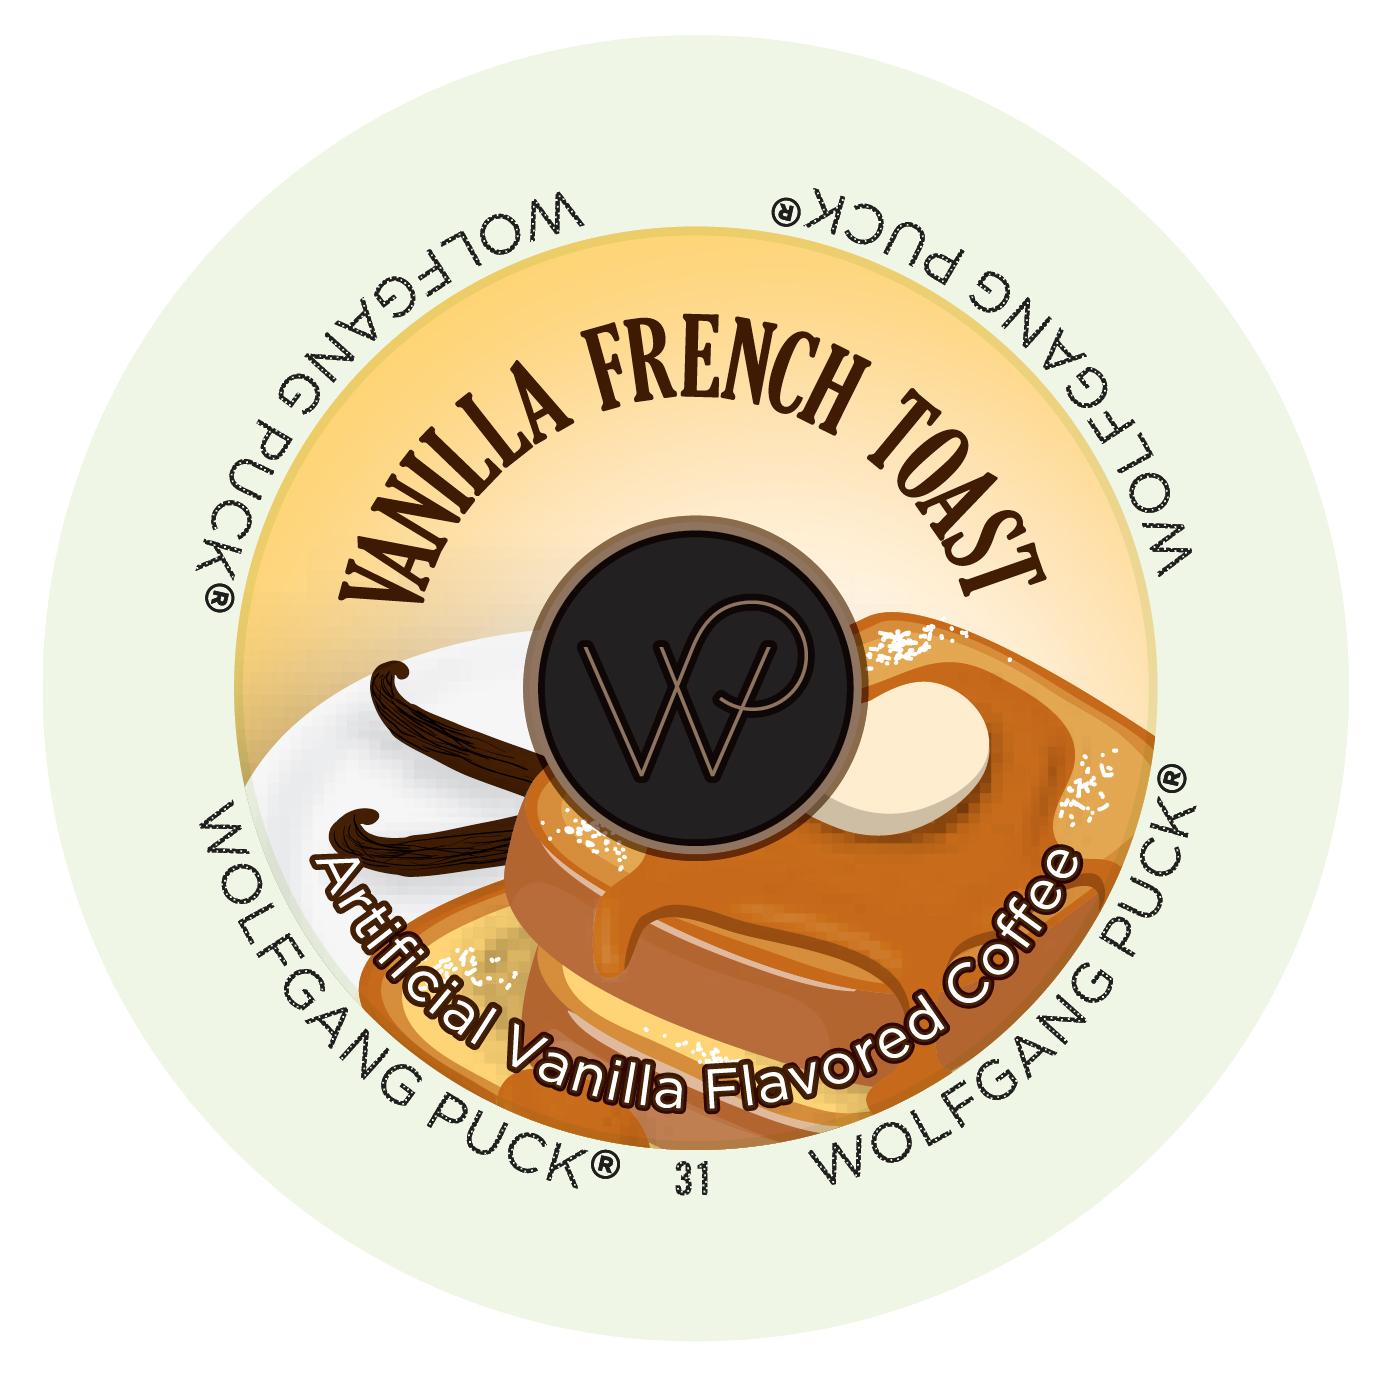 Martinson Keurig K-Cup Brewers Compatible RealCup Coffee ...